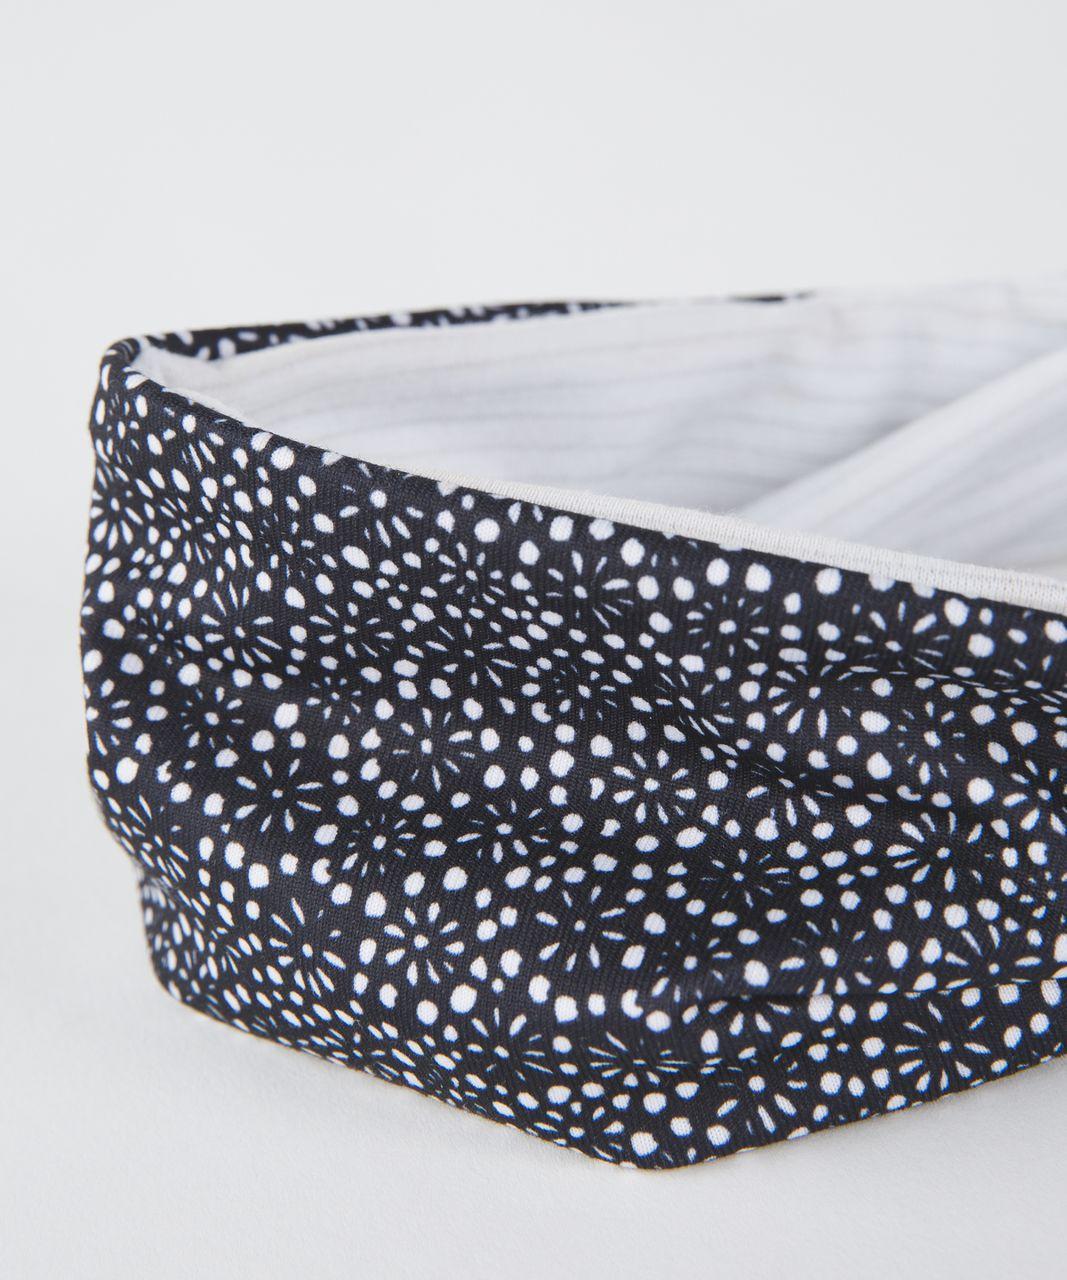 Lululemon Fringe Fighter Headband - Freckle Flower Black White / Heathered White